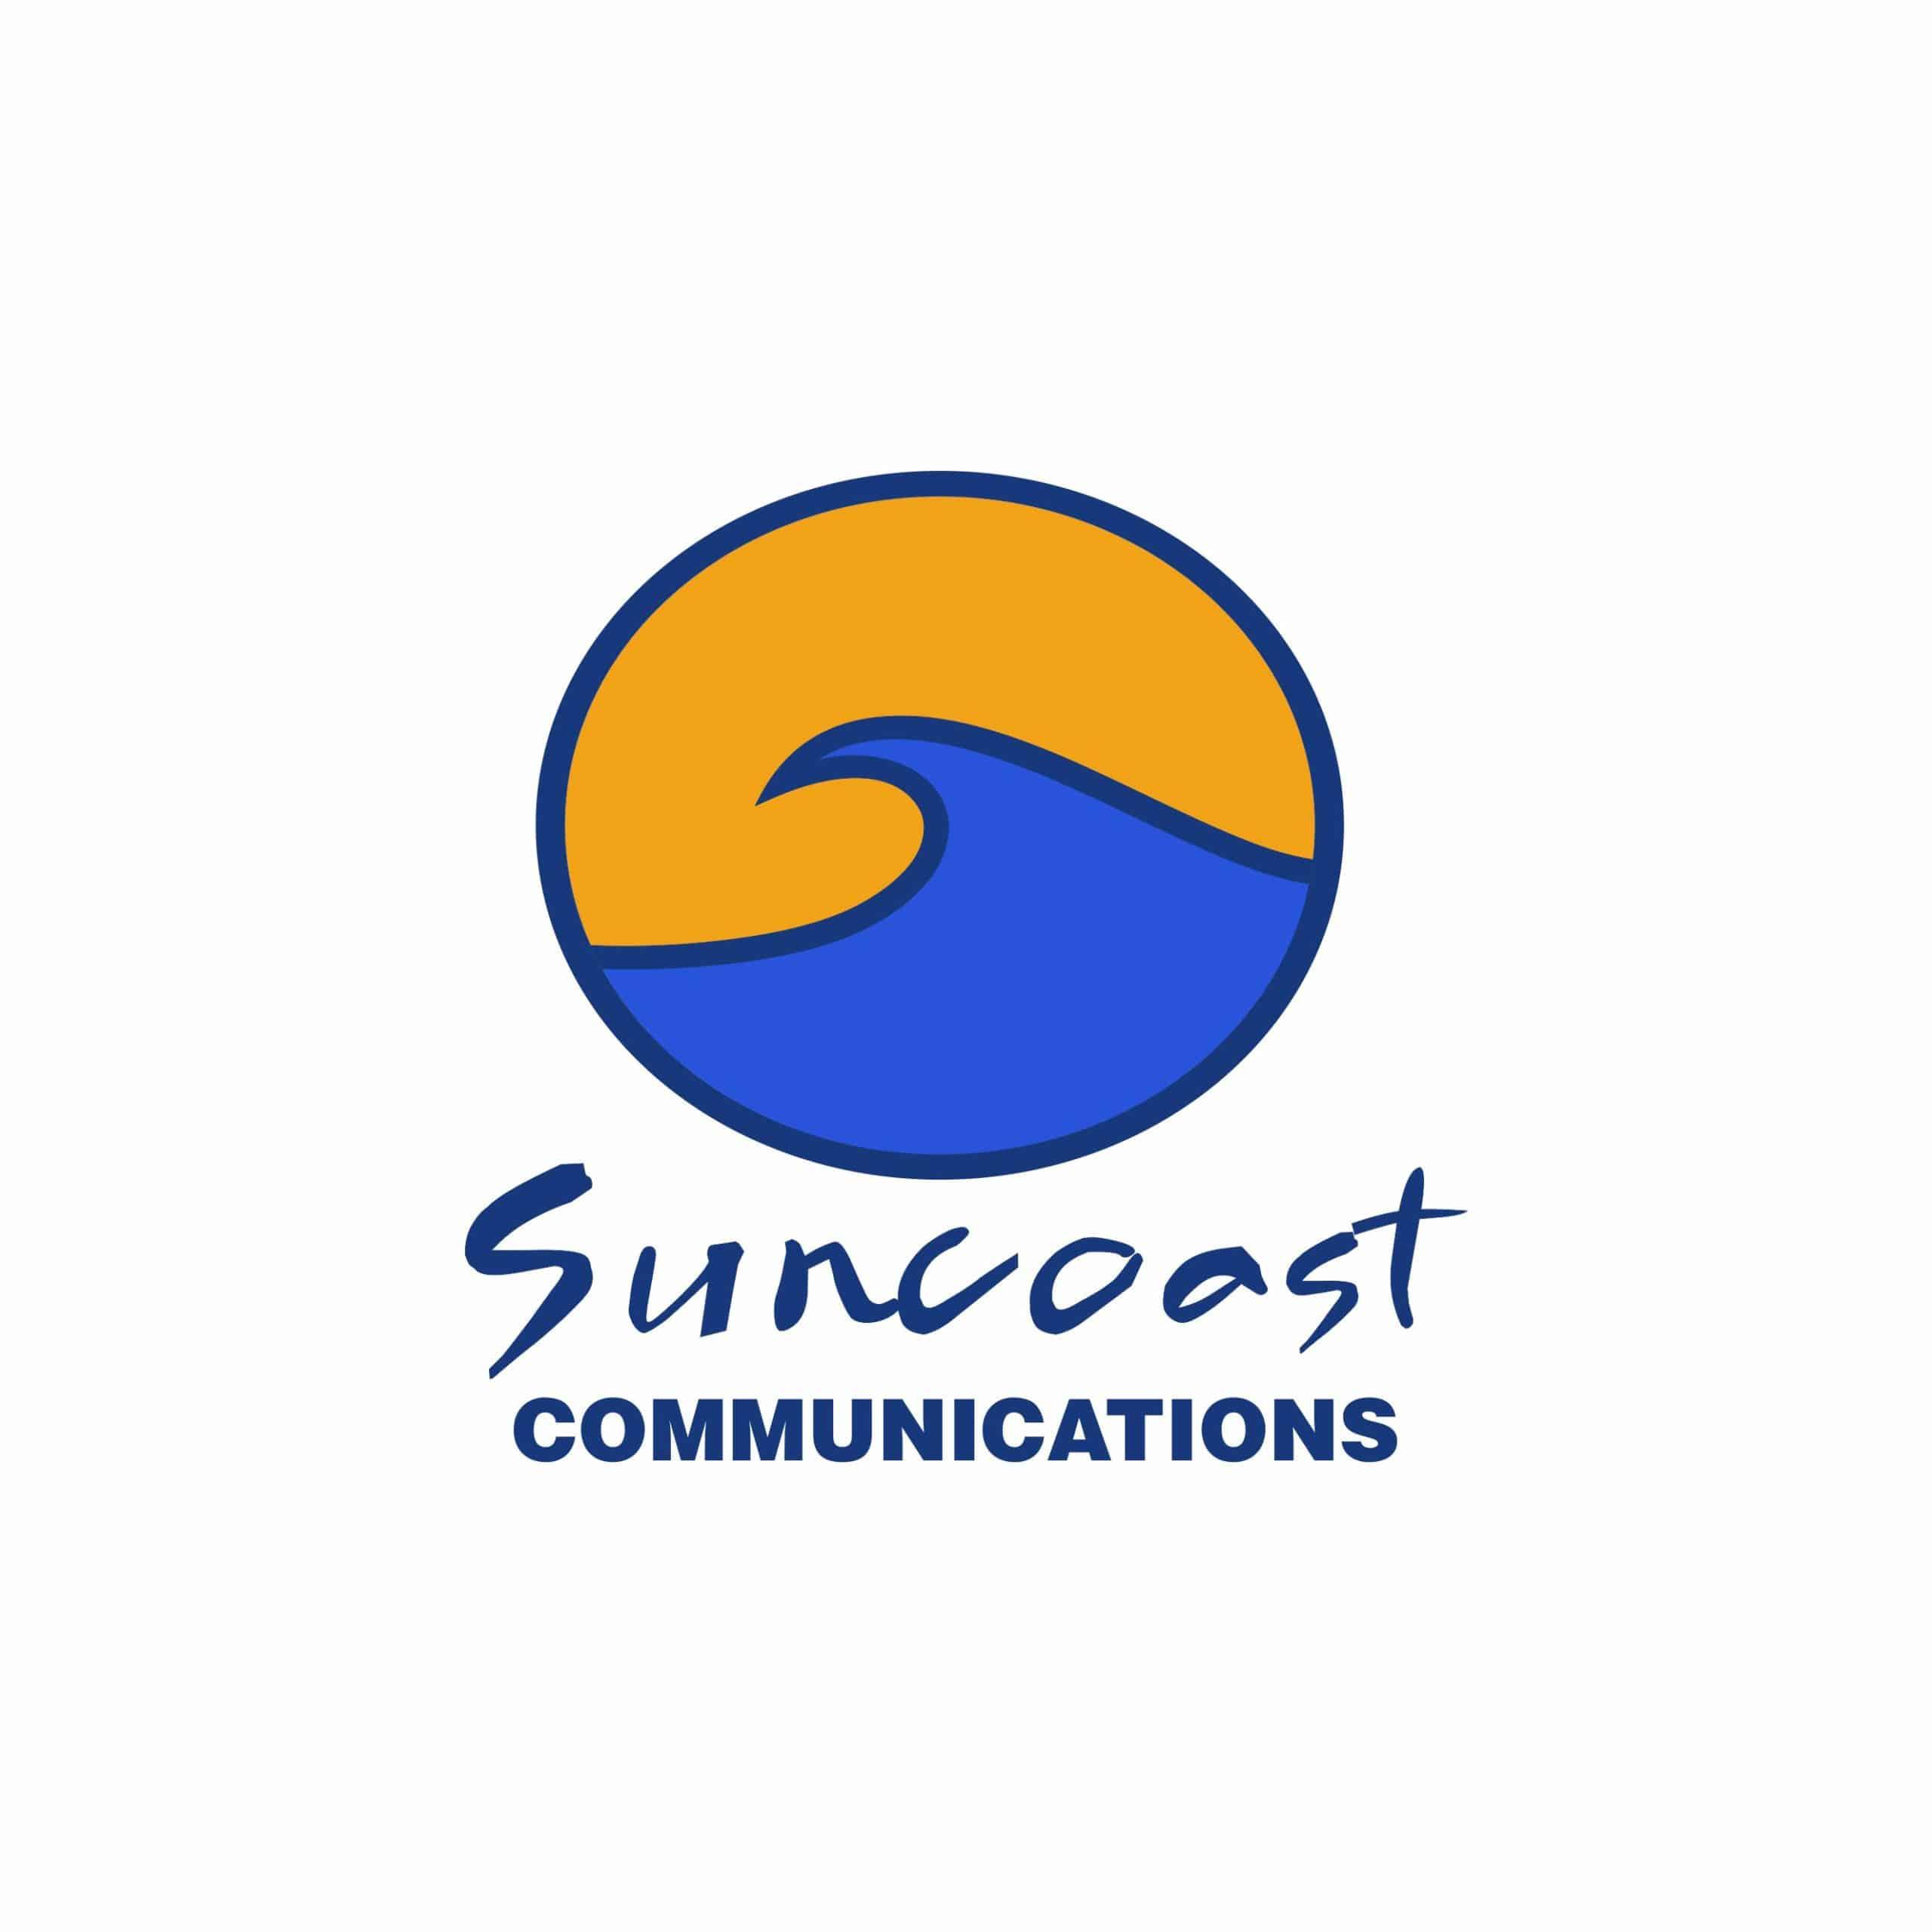 Logo gallery 53 Suncoast